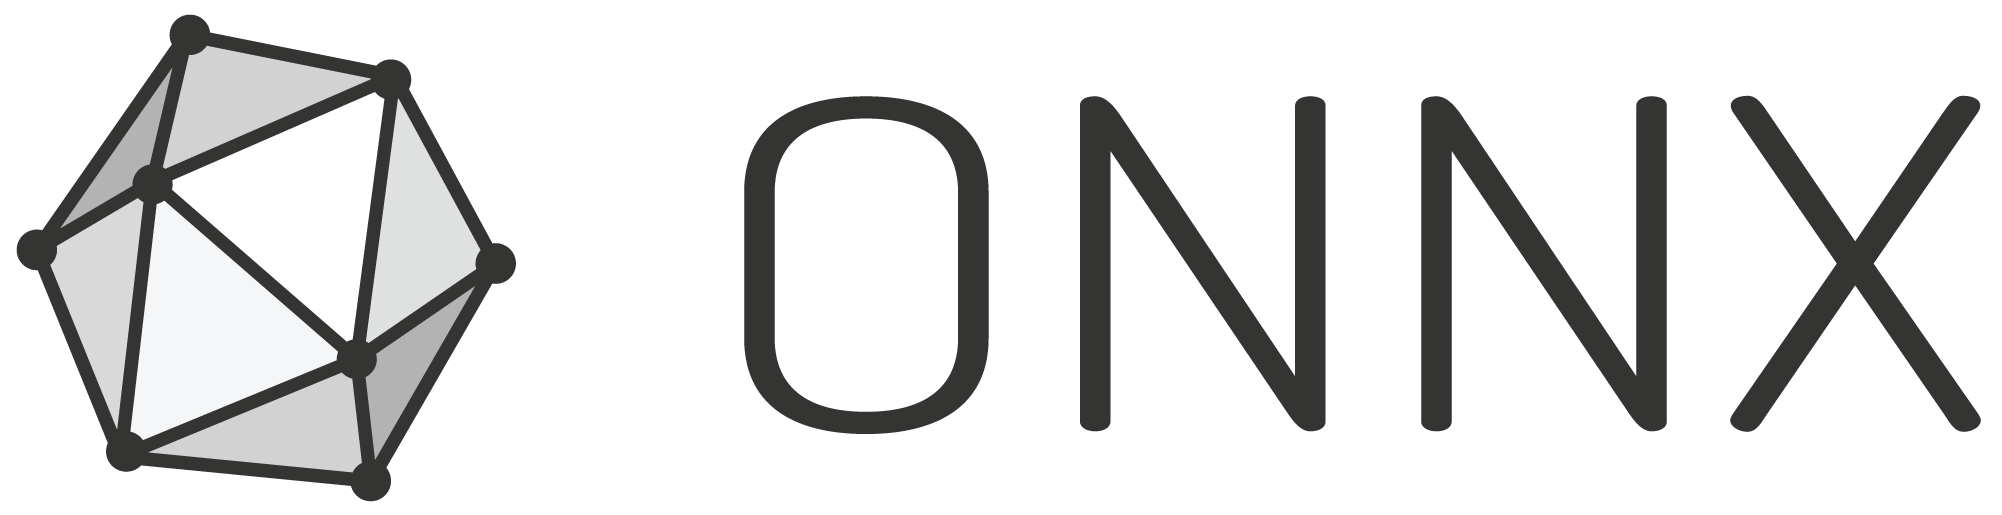 The ONNX logo